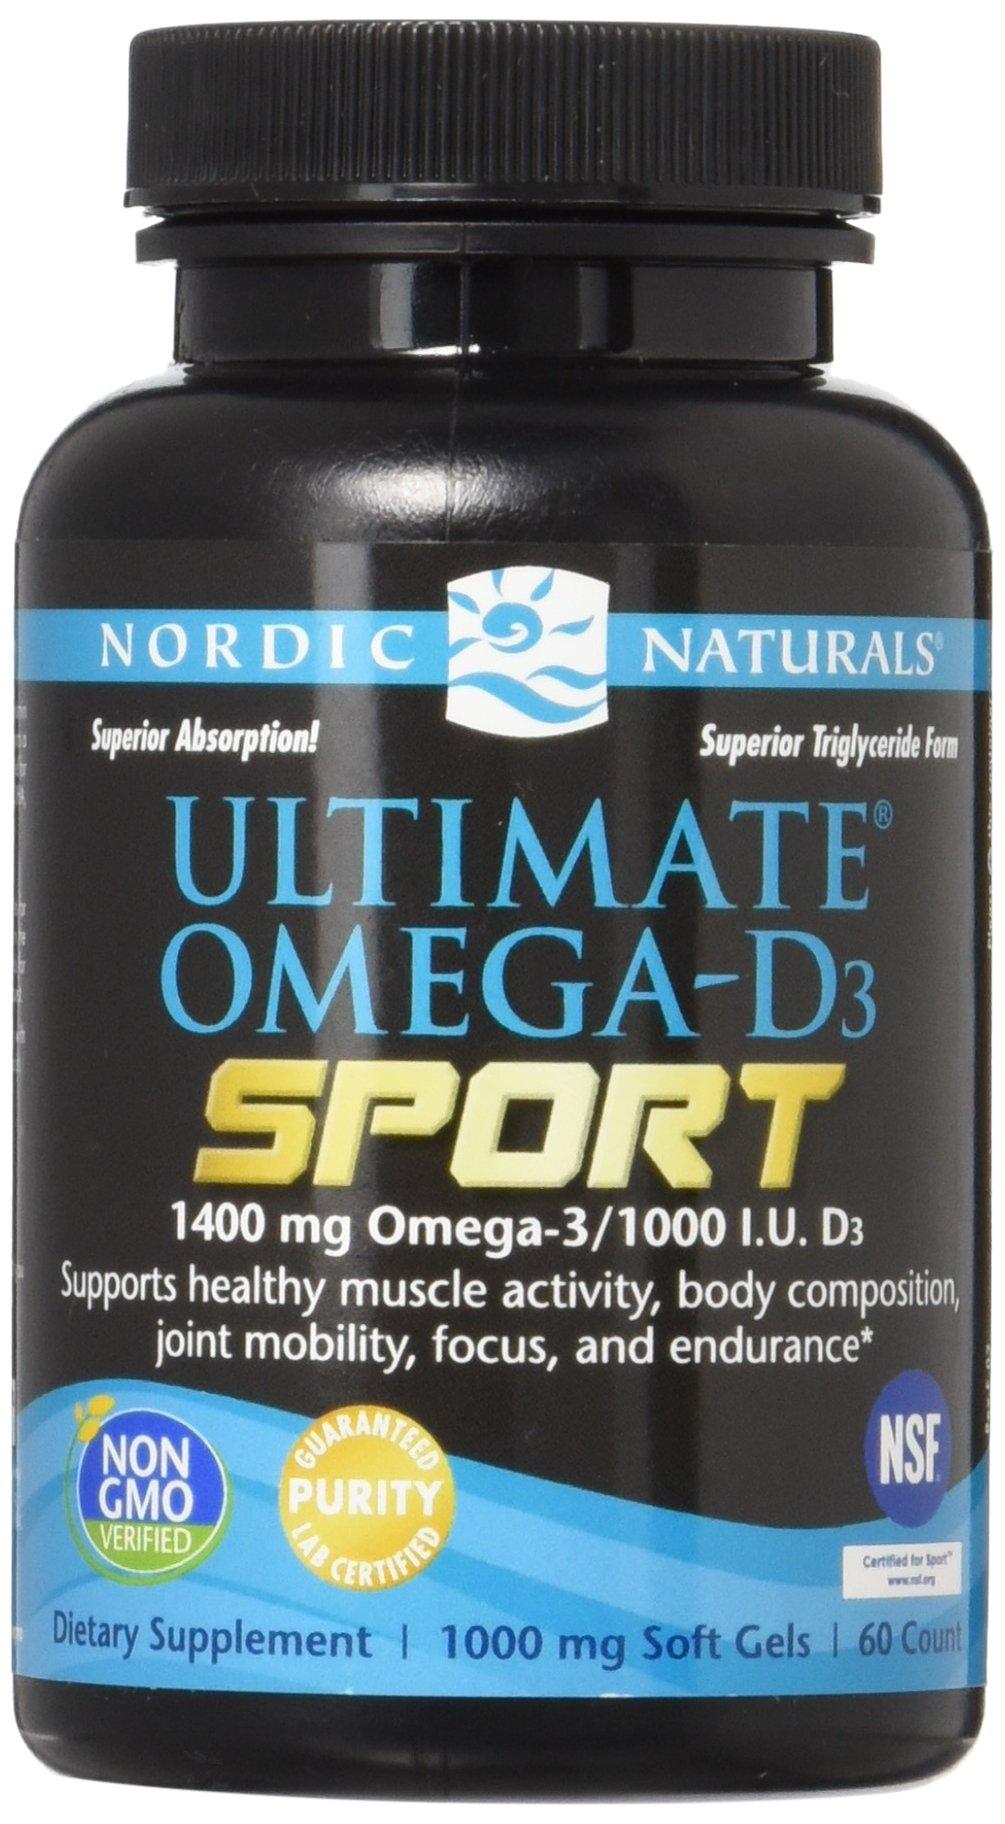 Nordic Naturals Utimate Omega-D3 Sport